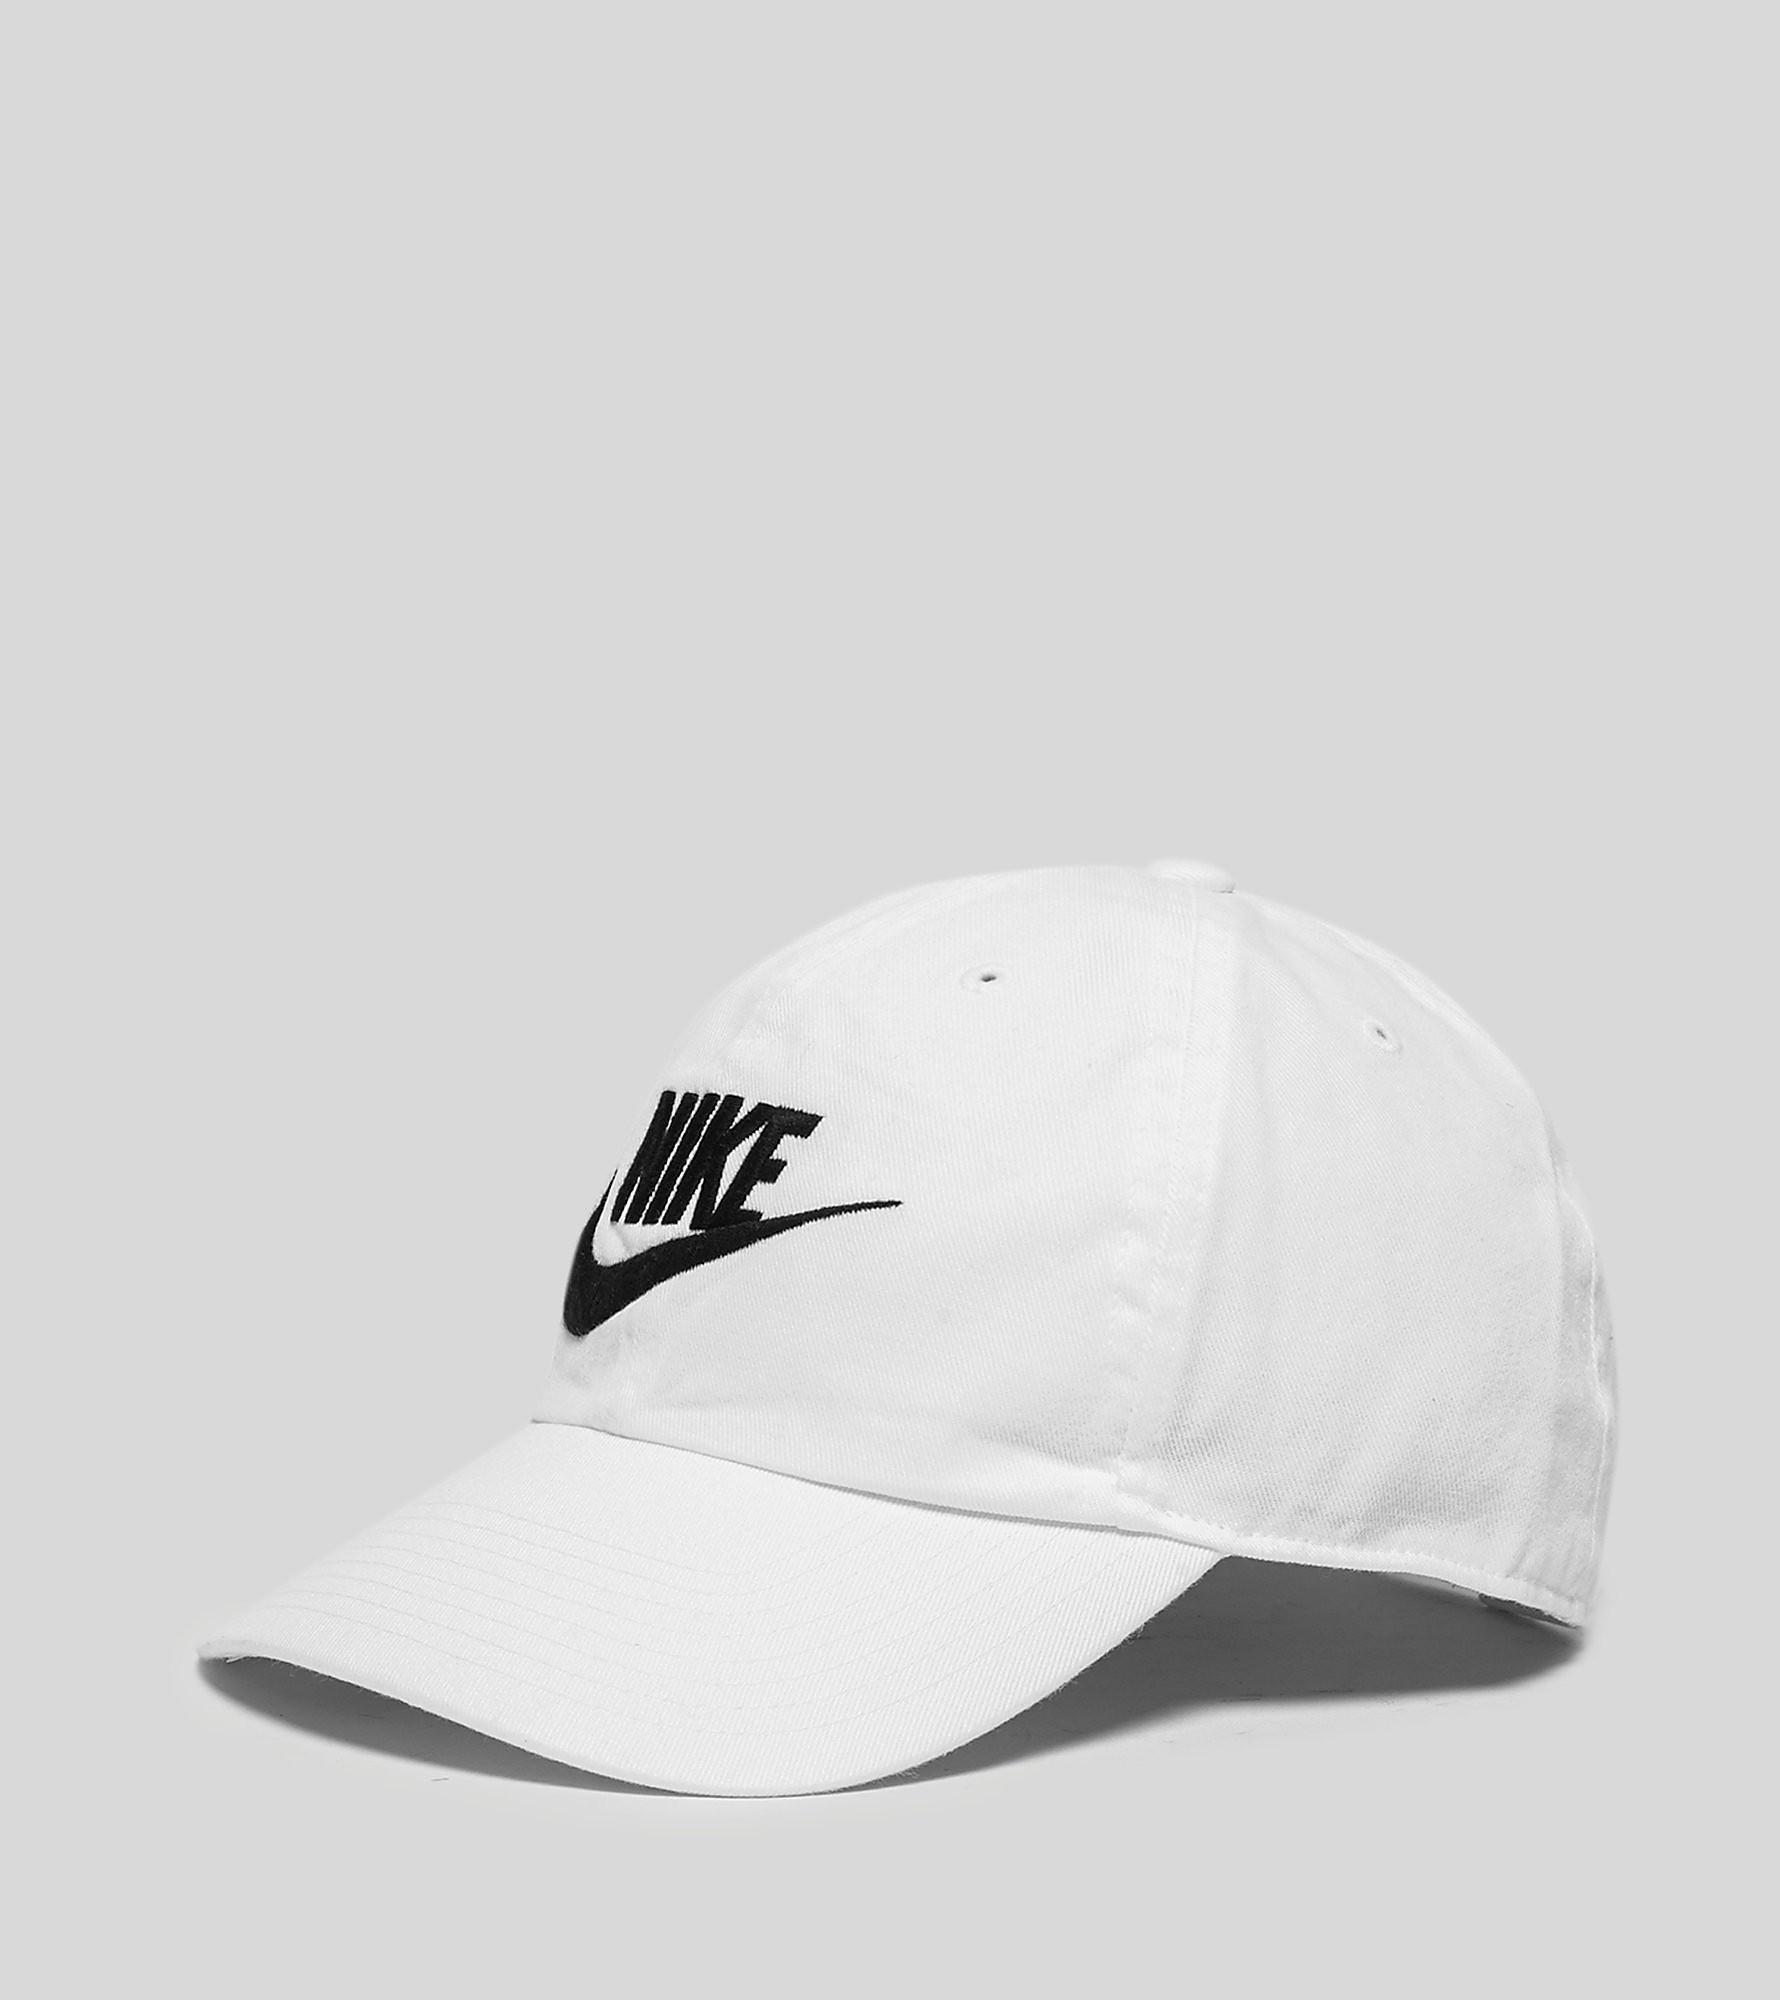 Nike Futura Washed Curved Cap